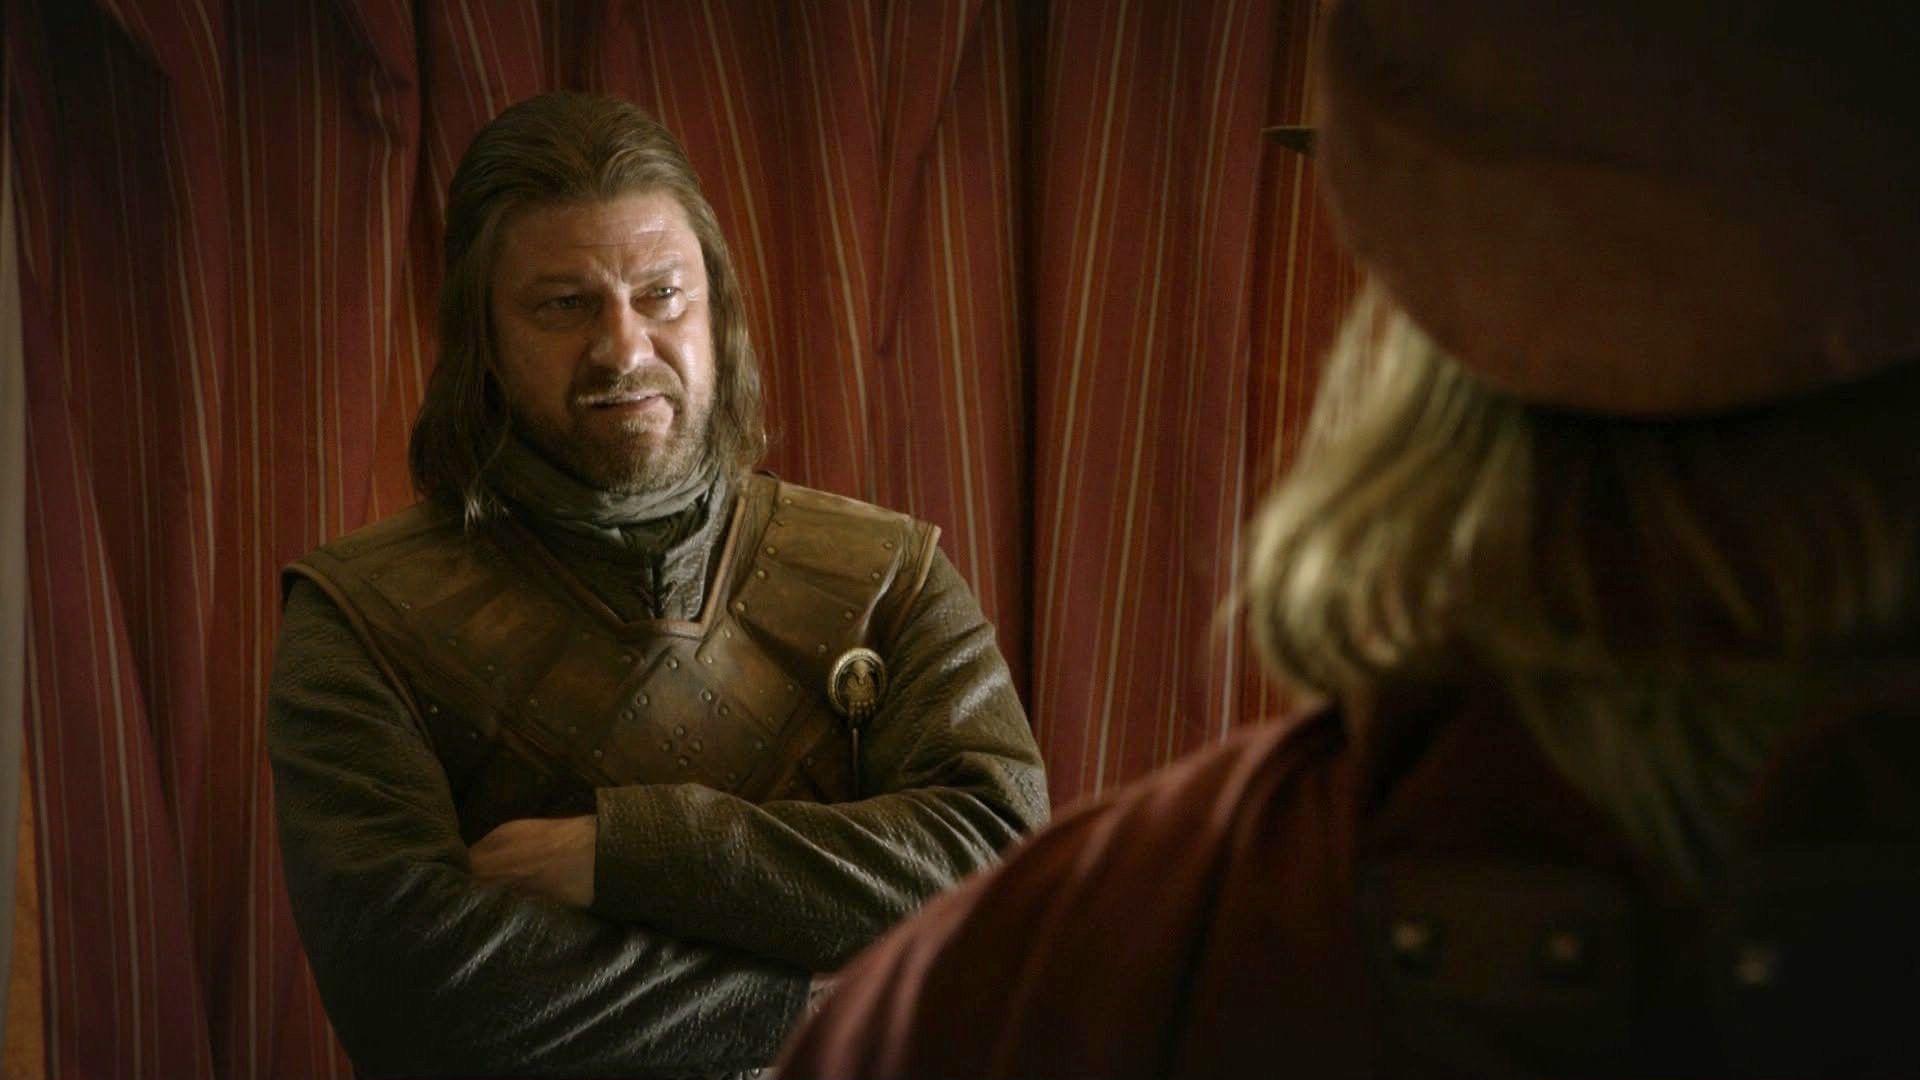 Game of thrones season 1 episode 1 russian subtitles